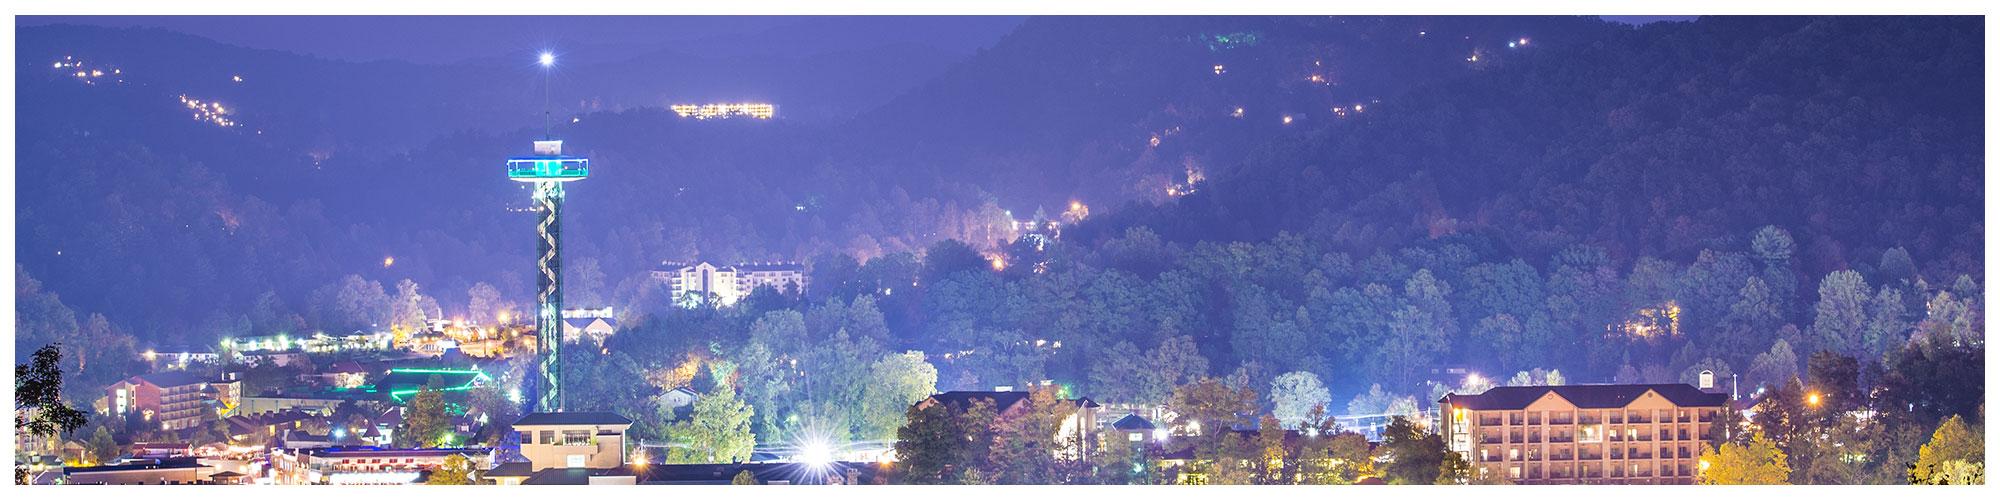 Space Needle (Header Background) | Gatlinburg Attractions